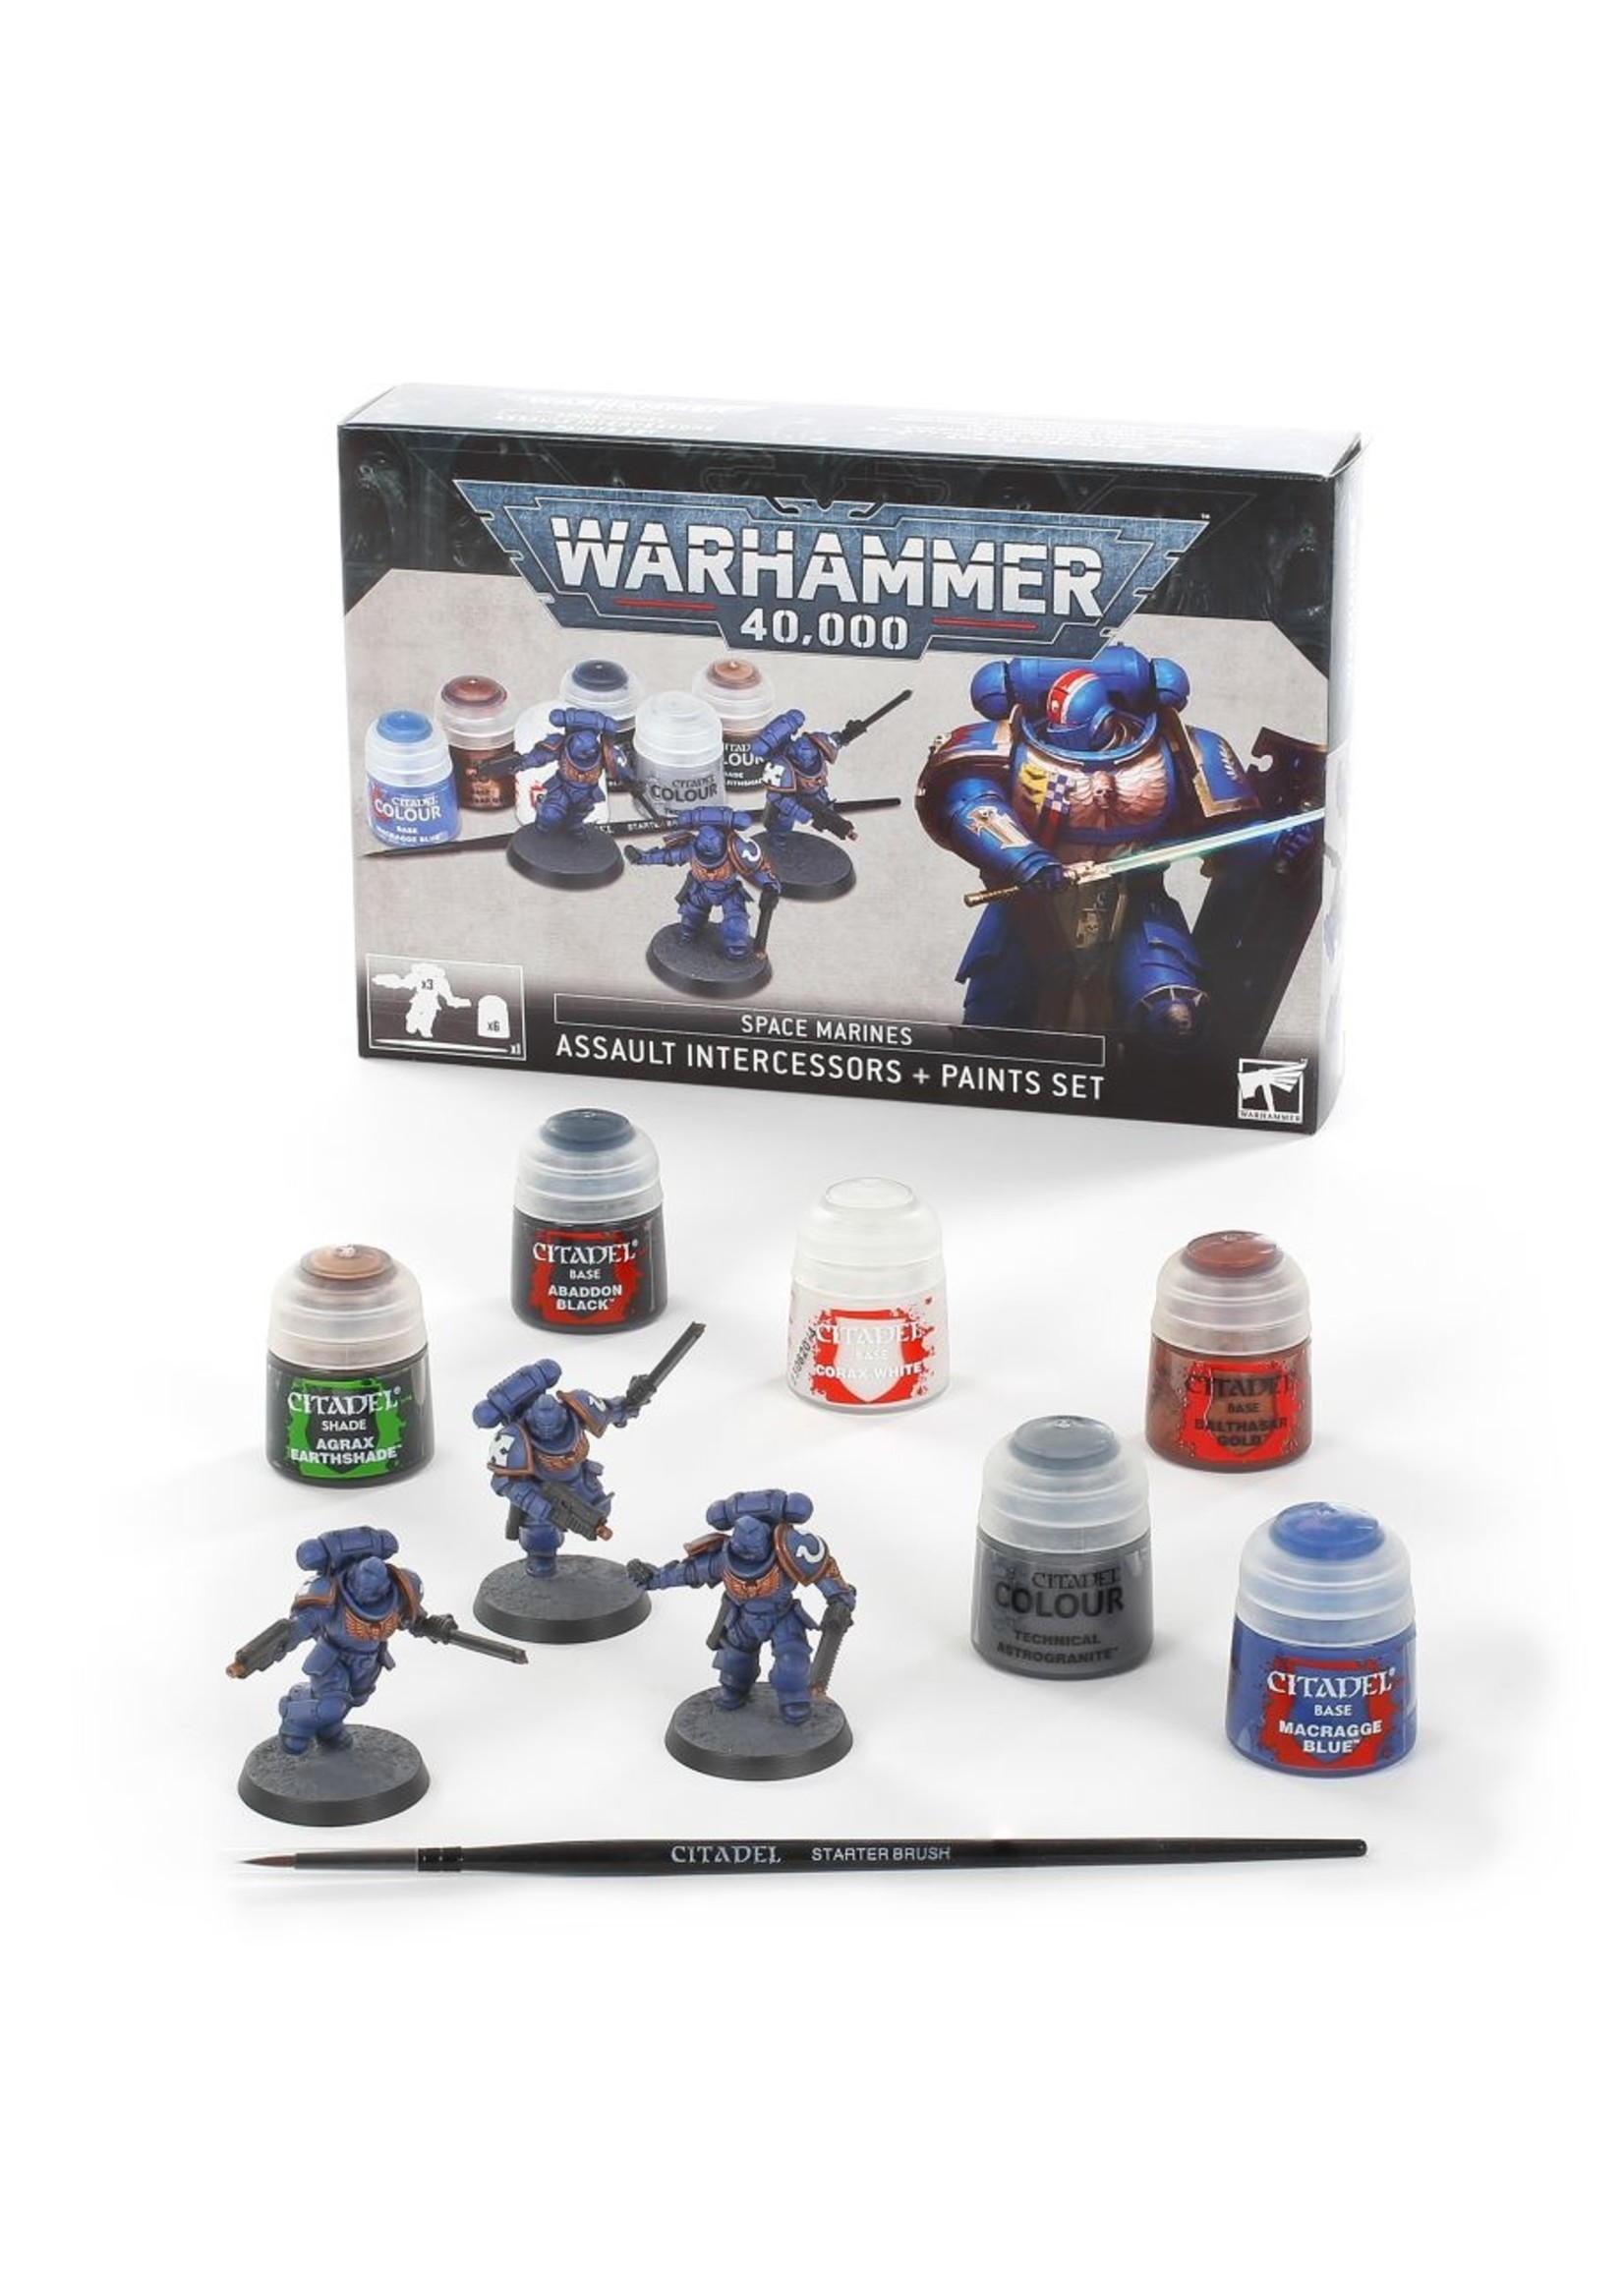 Warhammer 40k: Space Marines Assault Intercessors + Paint Set